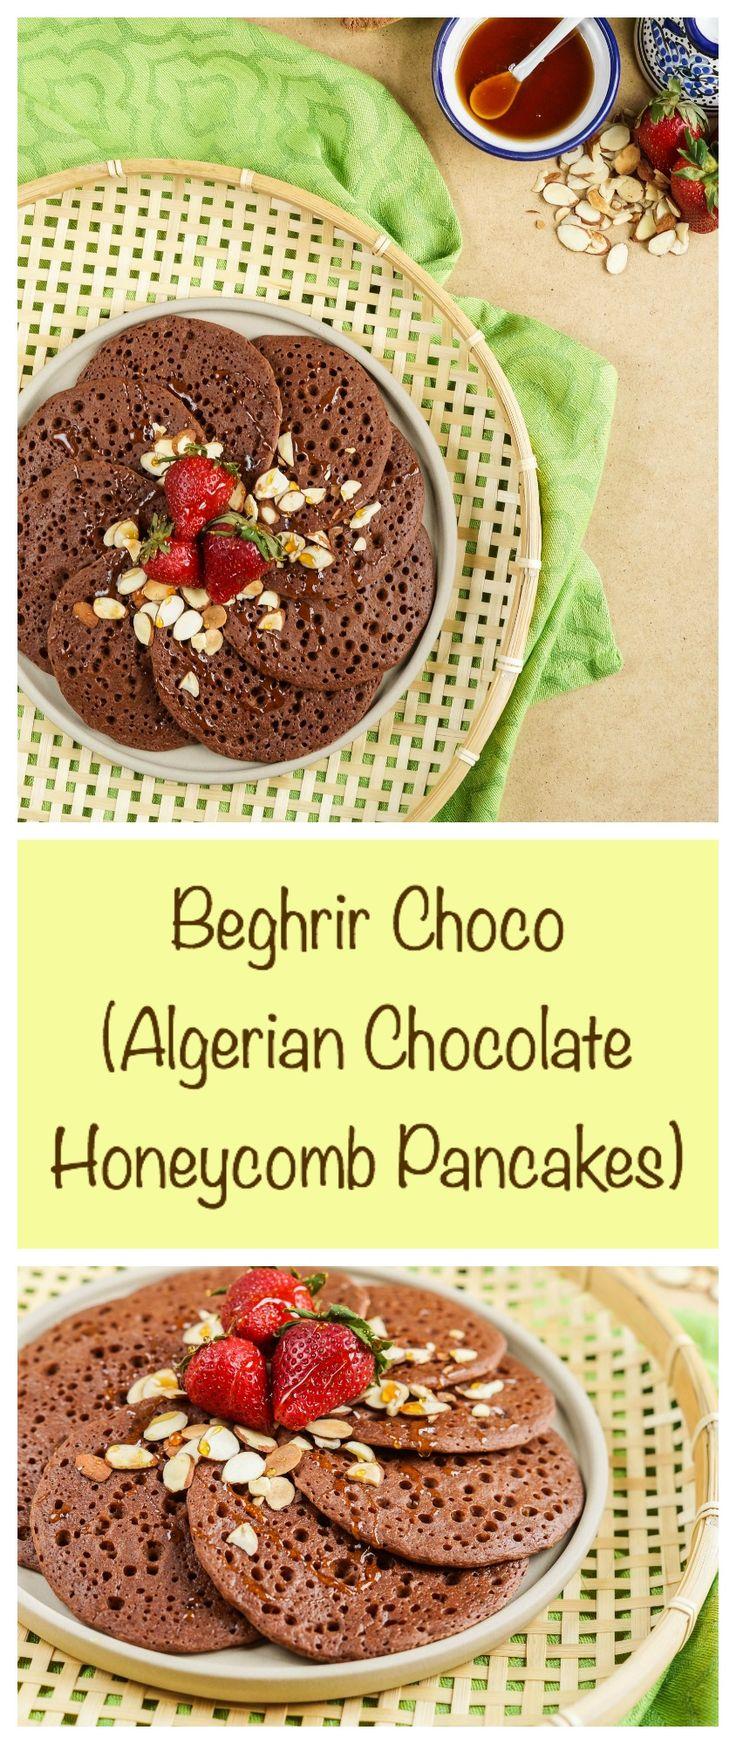 Beghrir Choco (Algerian Chocolate Honeycomb Pancakes)